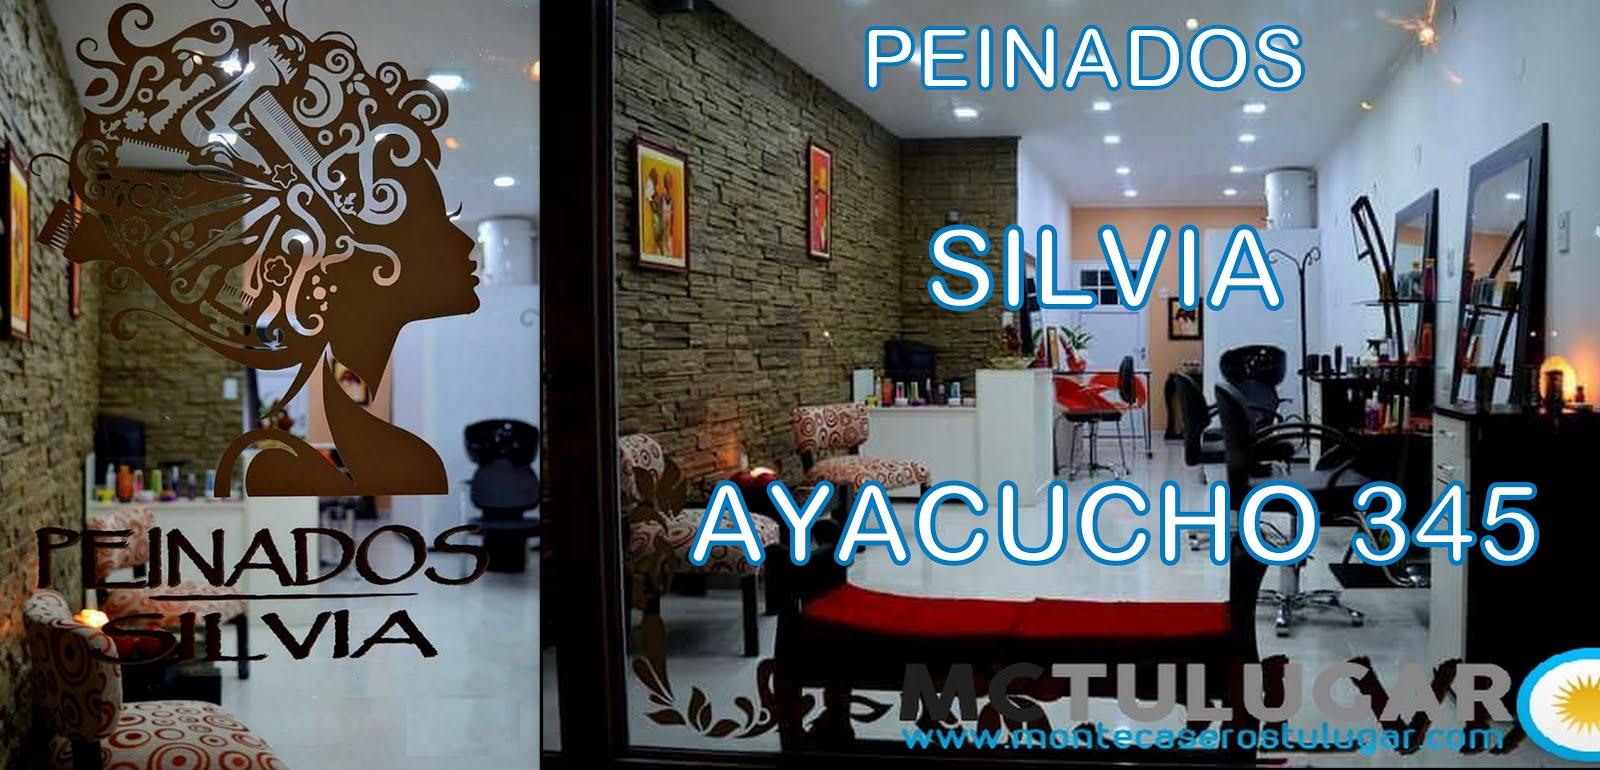 PEINADOS SILVIA Ayacucho 345